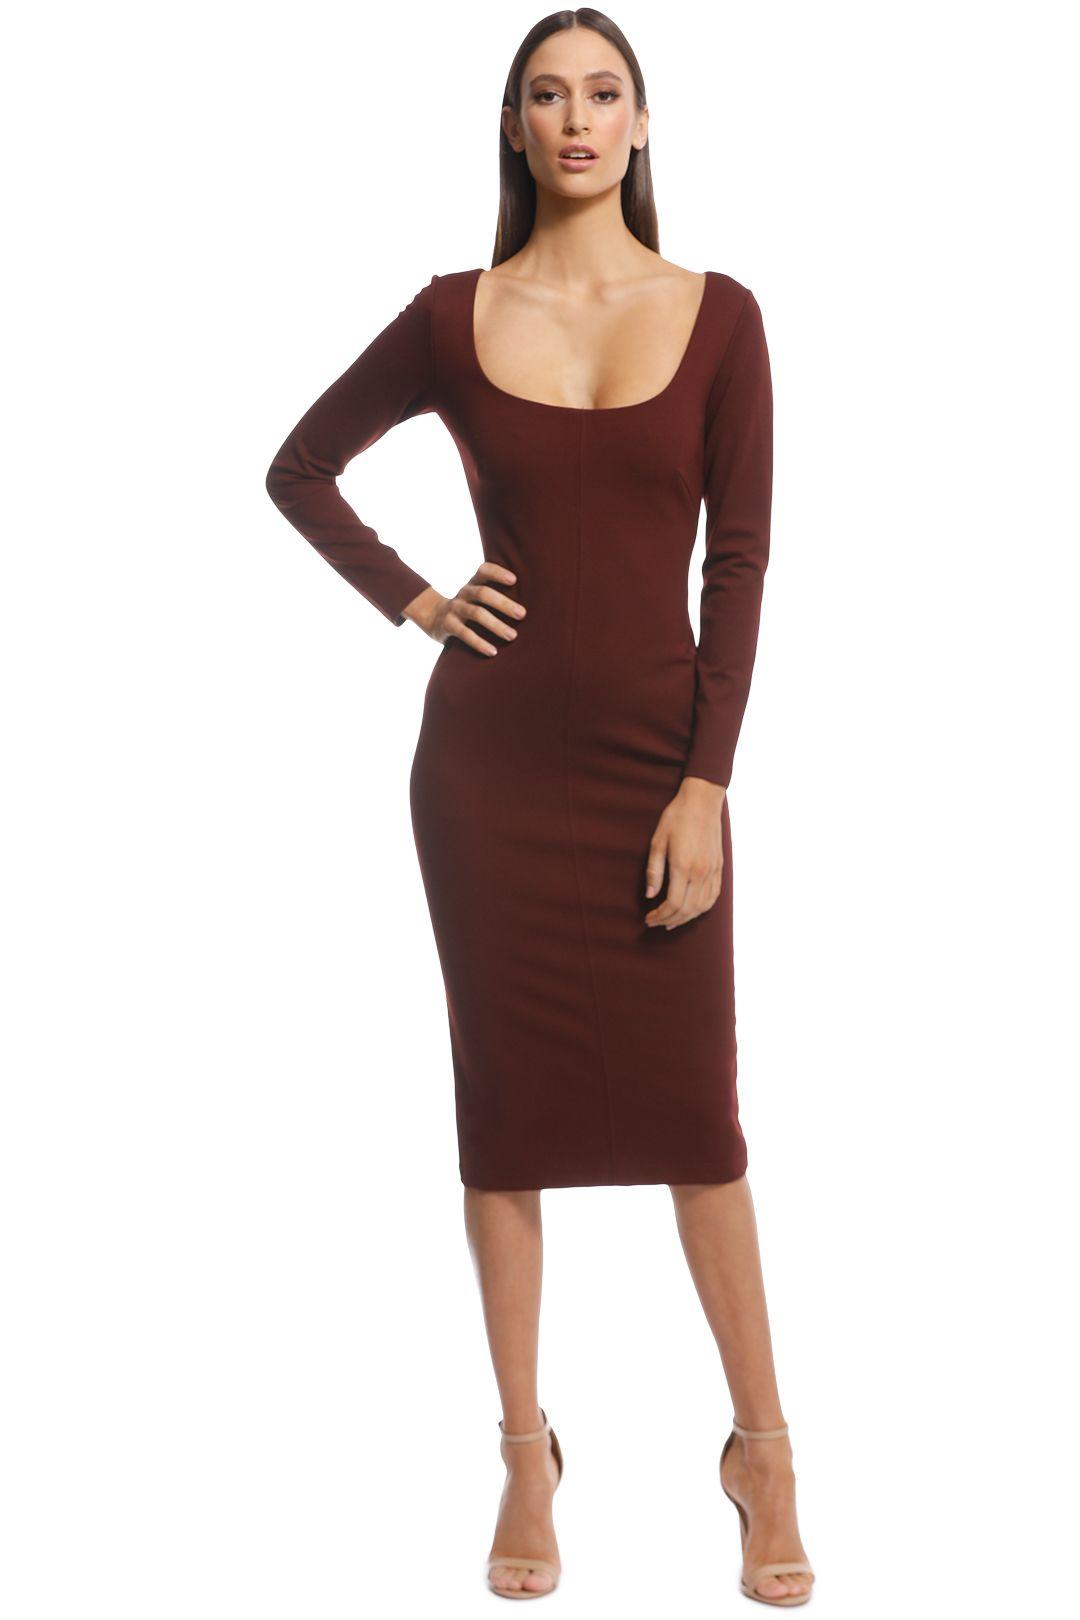 Pasduchas - Destiny Midi Dress - Burgundy - Front